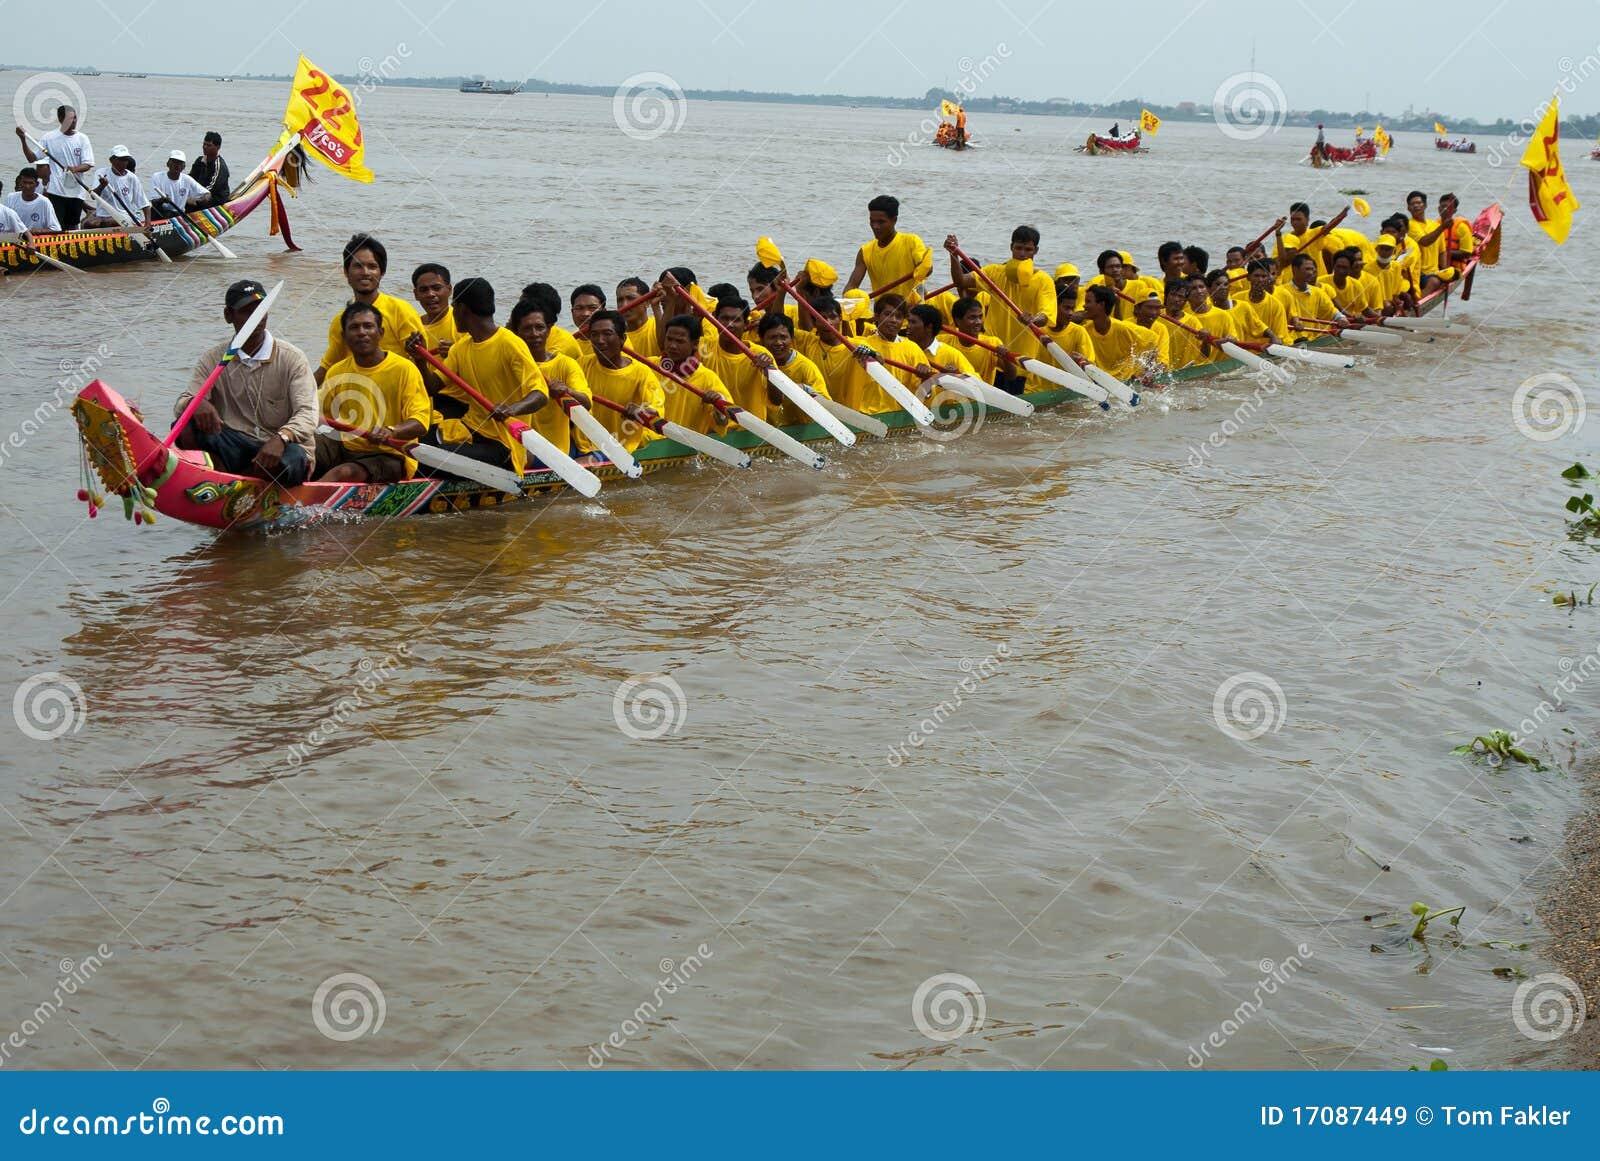 Kambodschanische WasserRegatta